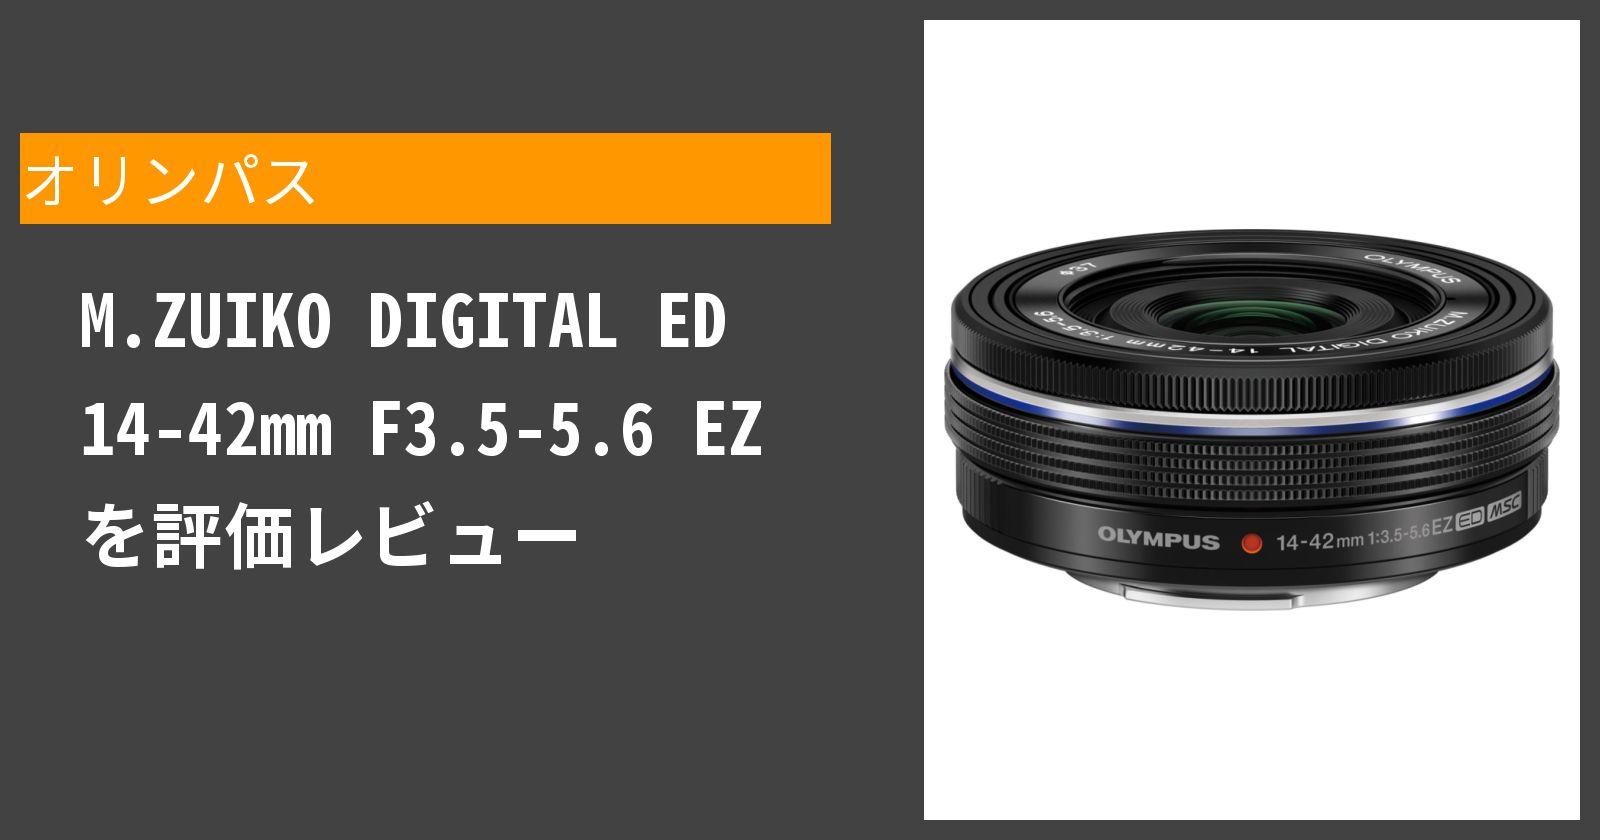 M.ZUIKO DIGITAL ED 14-42mm F3.5-5.6 EZを徹底評価